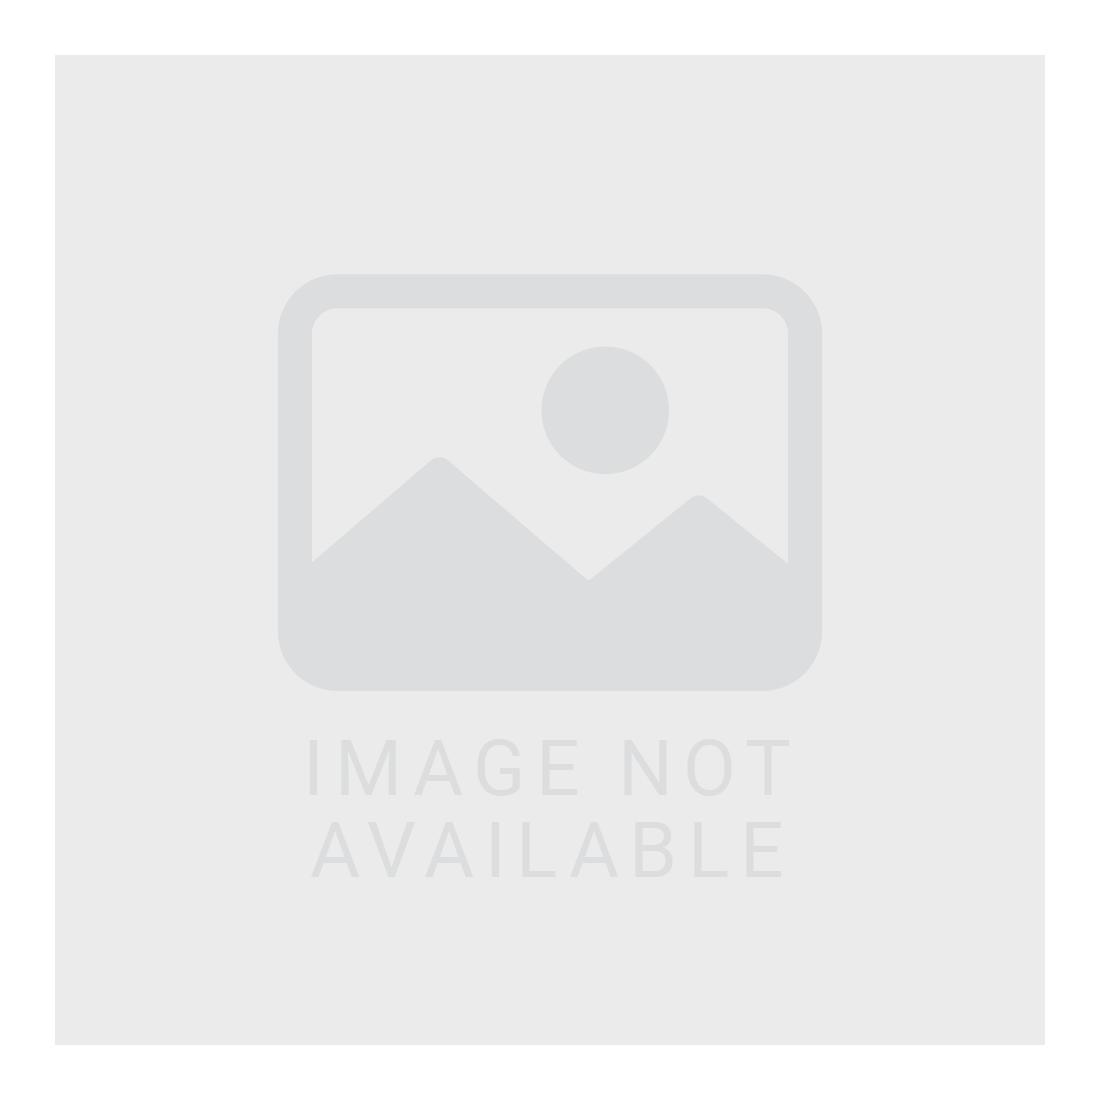 $100 FIAT Merchandise Gift Card